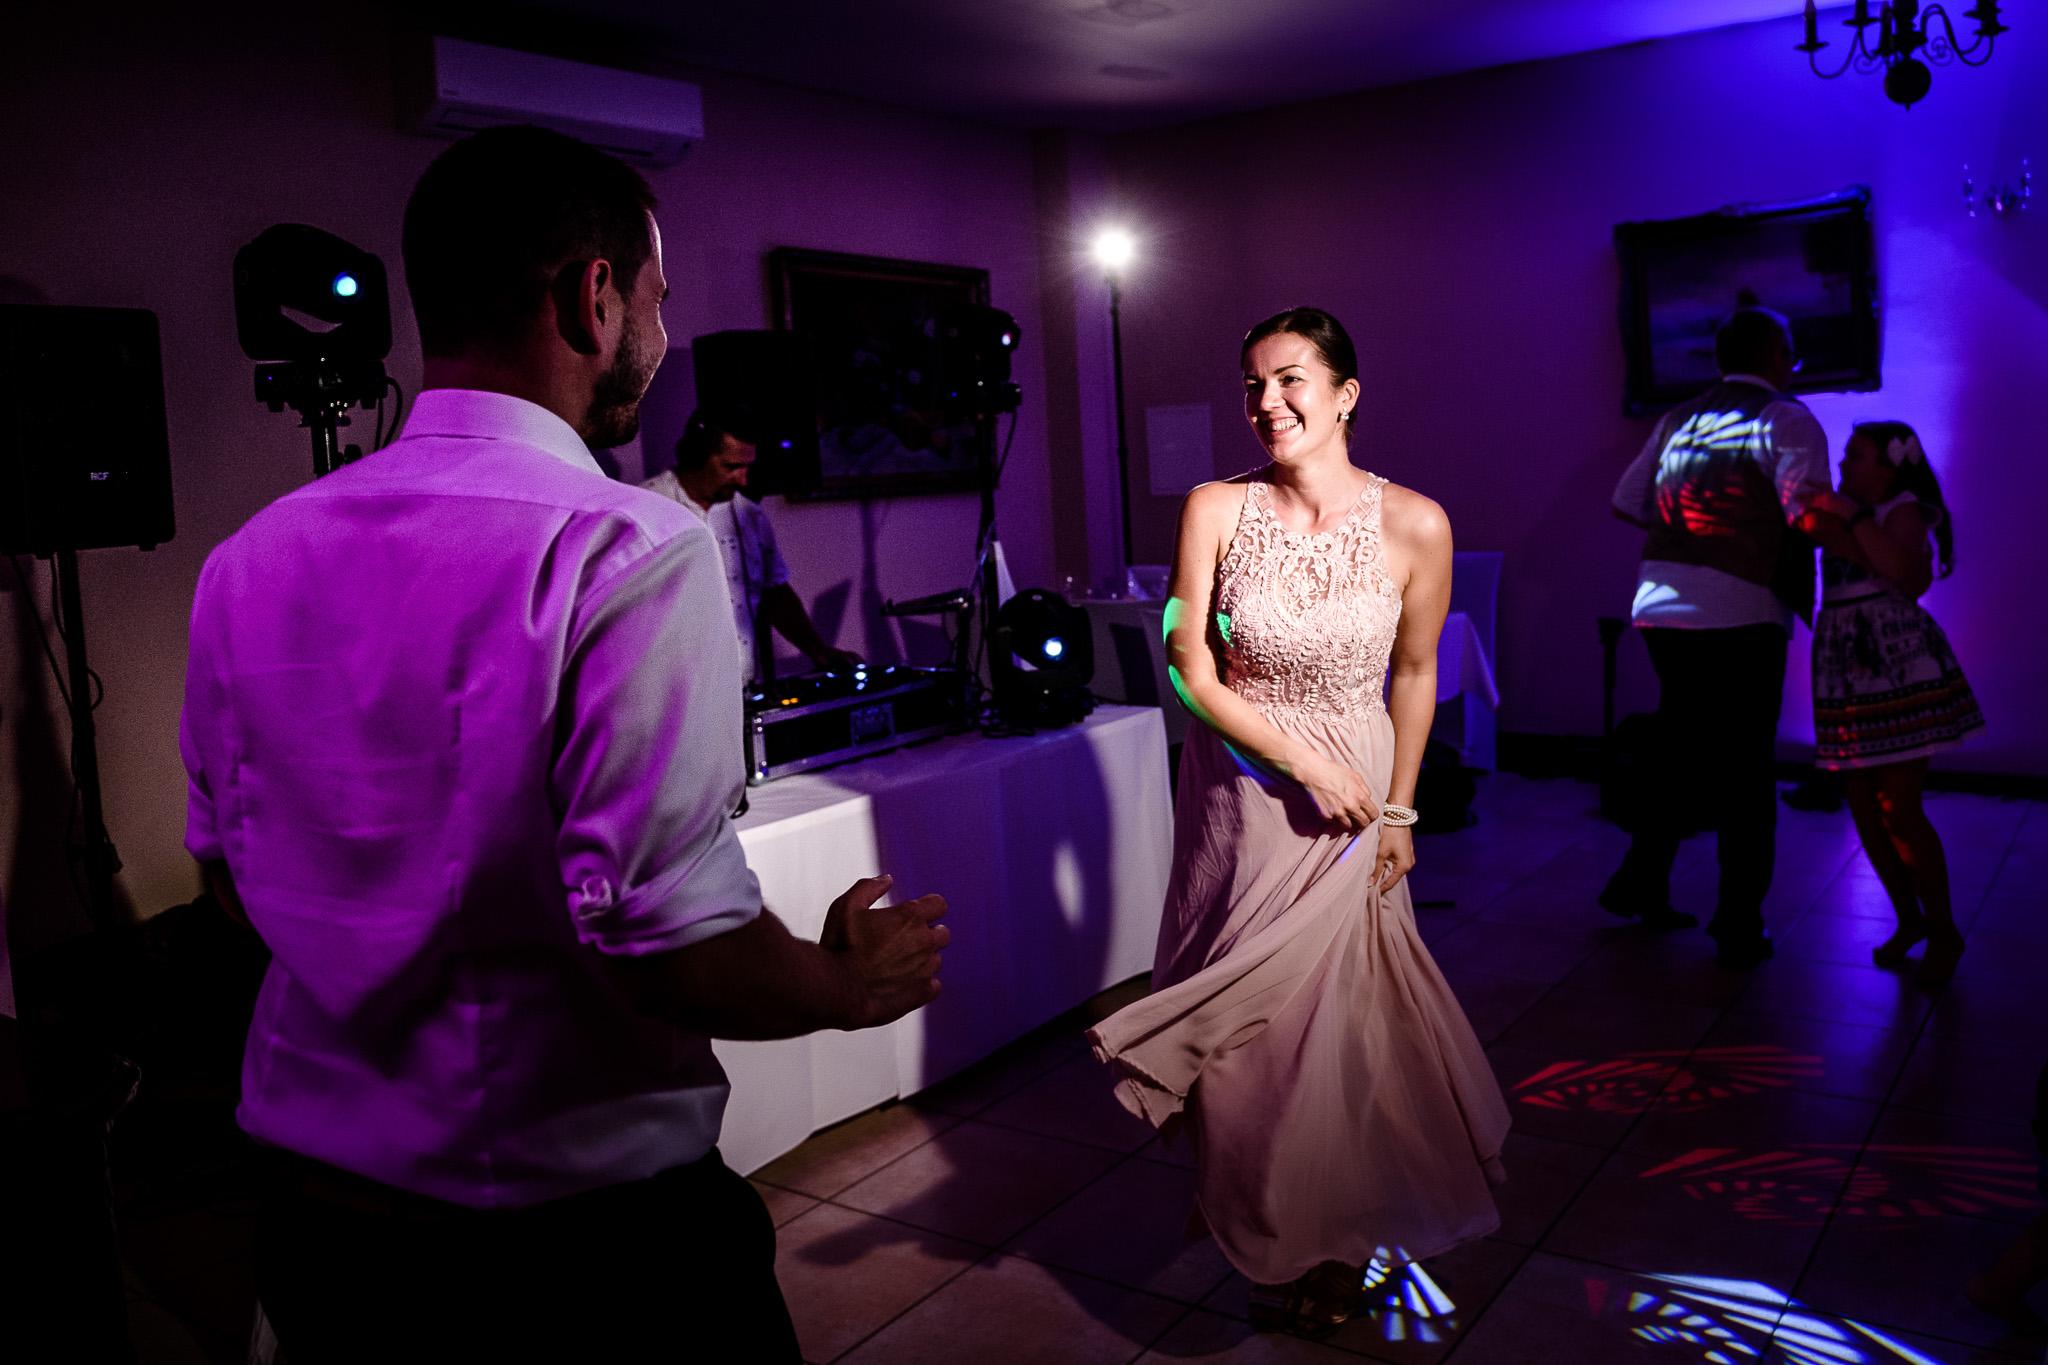 Svadba St. Petrus, Svätý Peter 04 #svadobnyDJ, #djanasvadbu, #svadba, #stpetrusvini, #DJAnavi